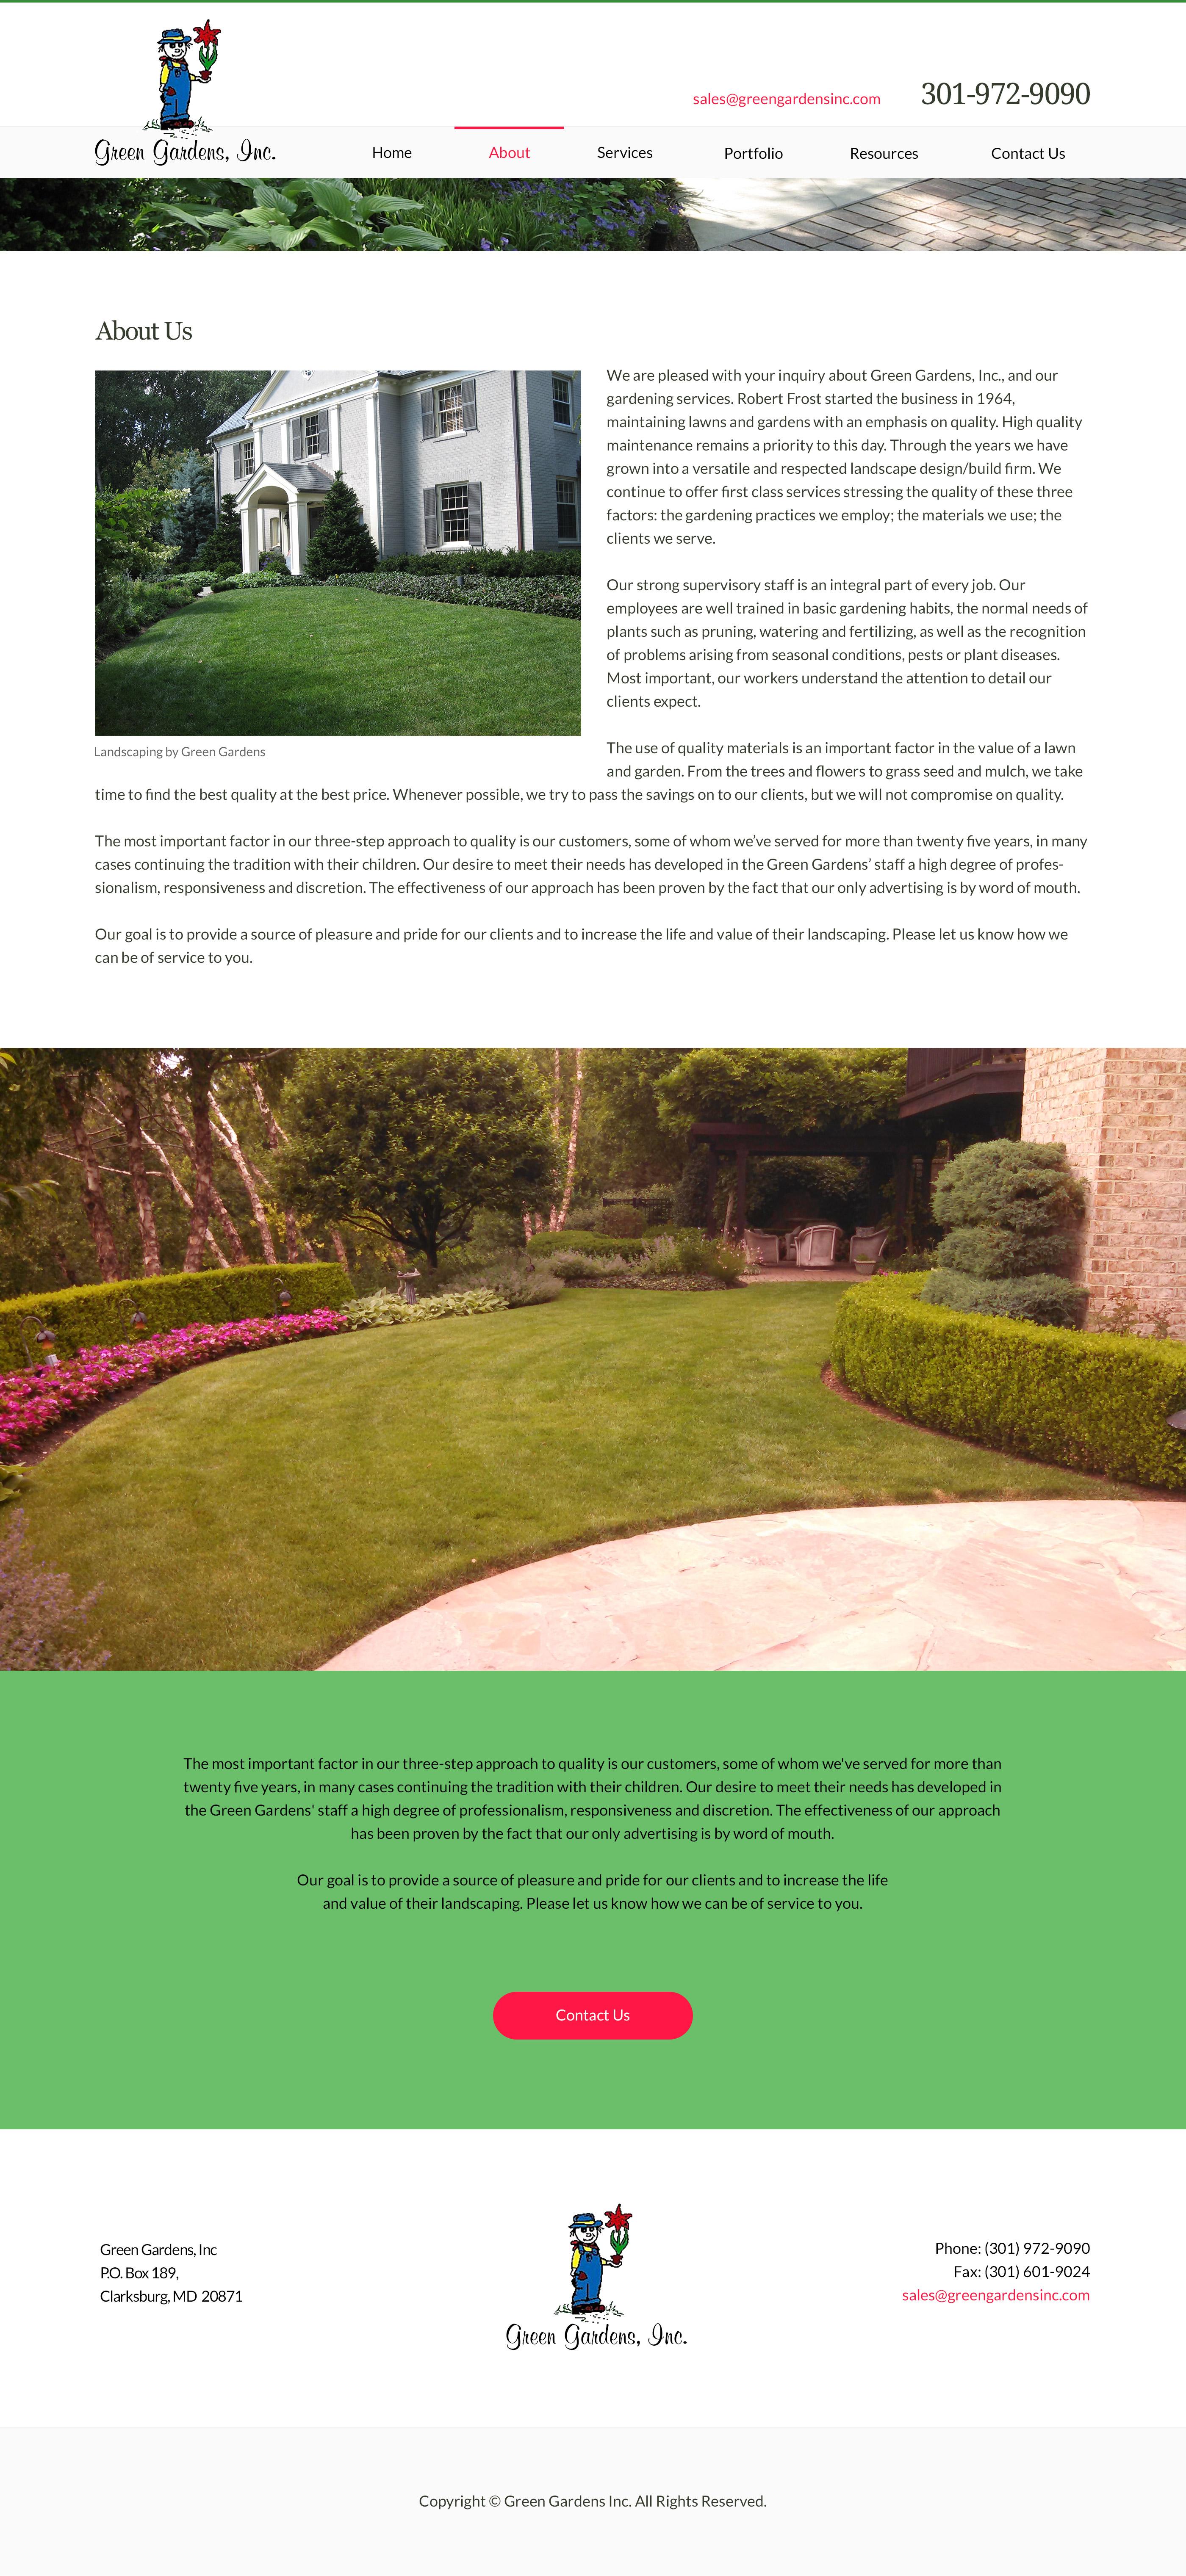 Greengardensinc.com About Page Design